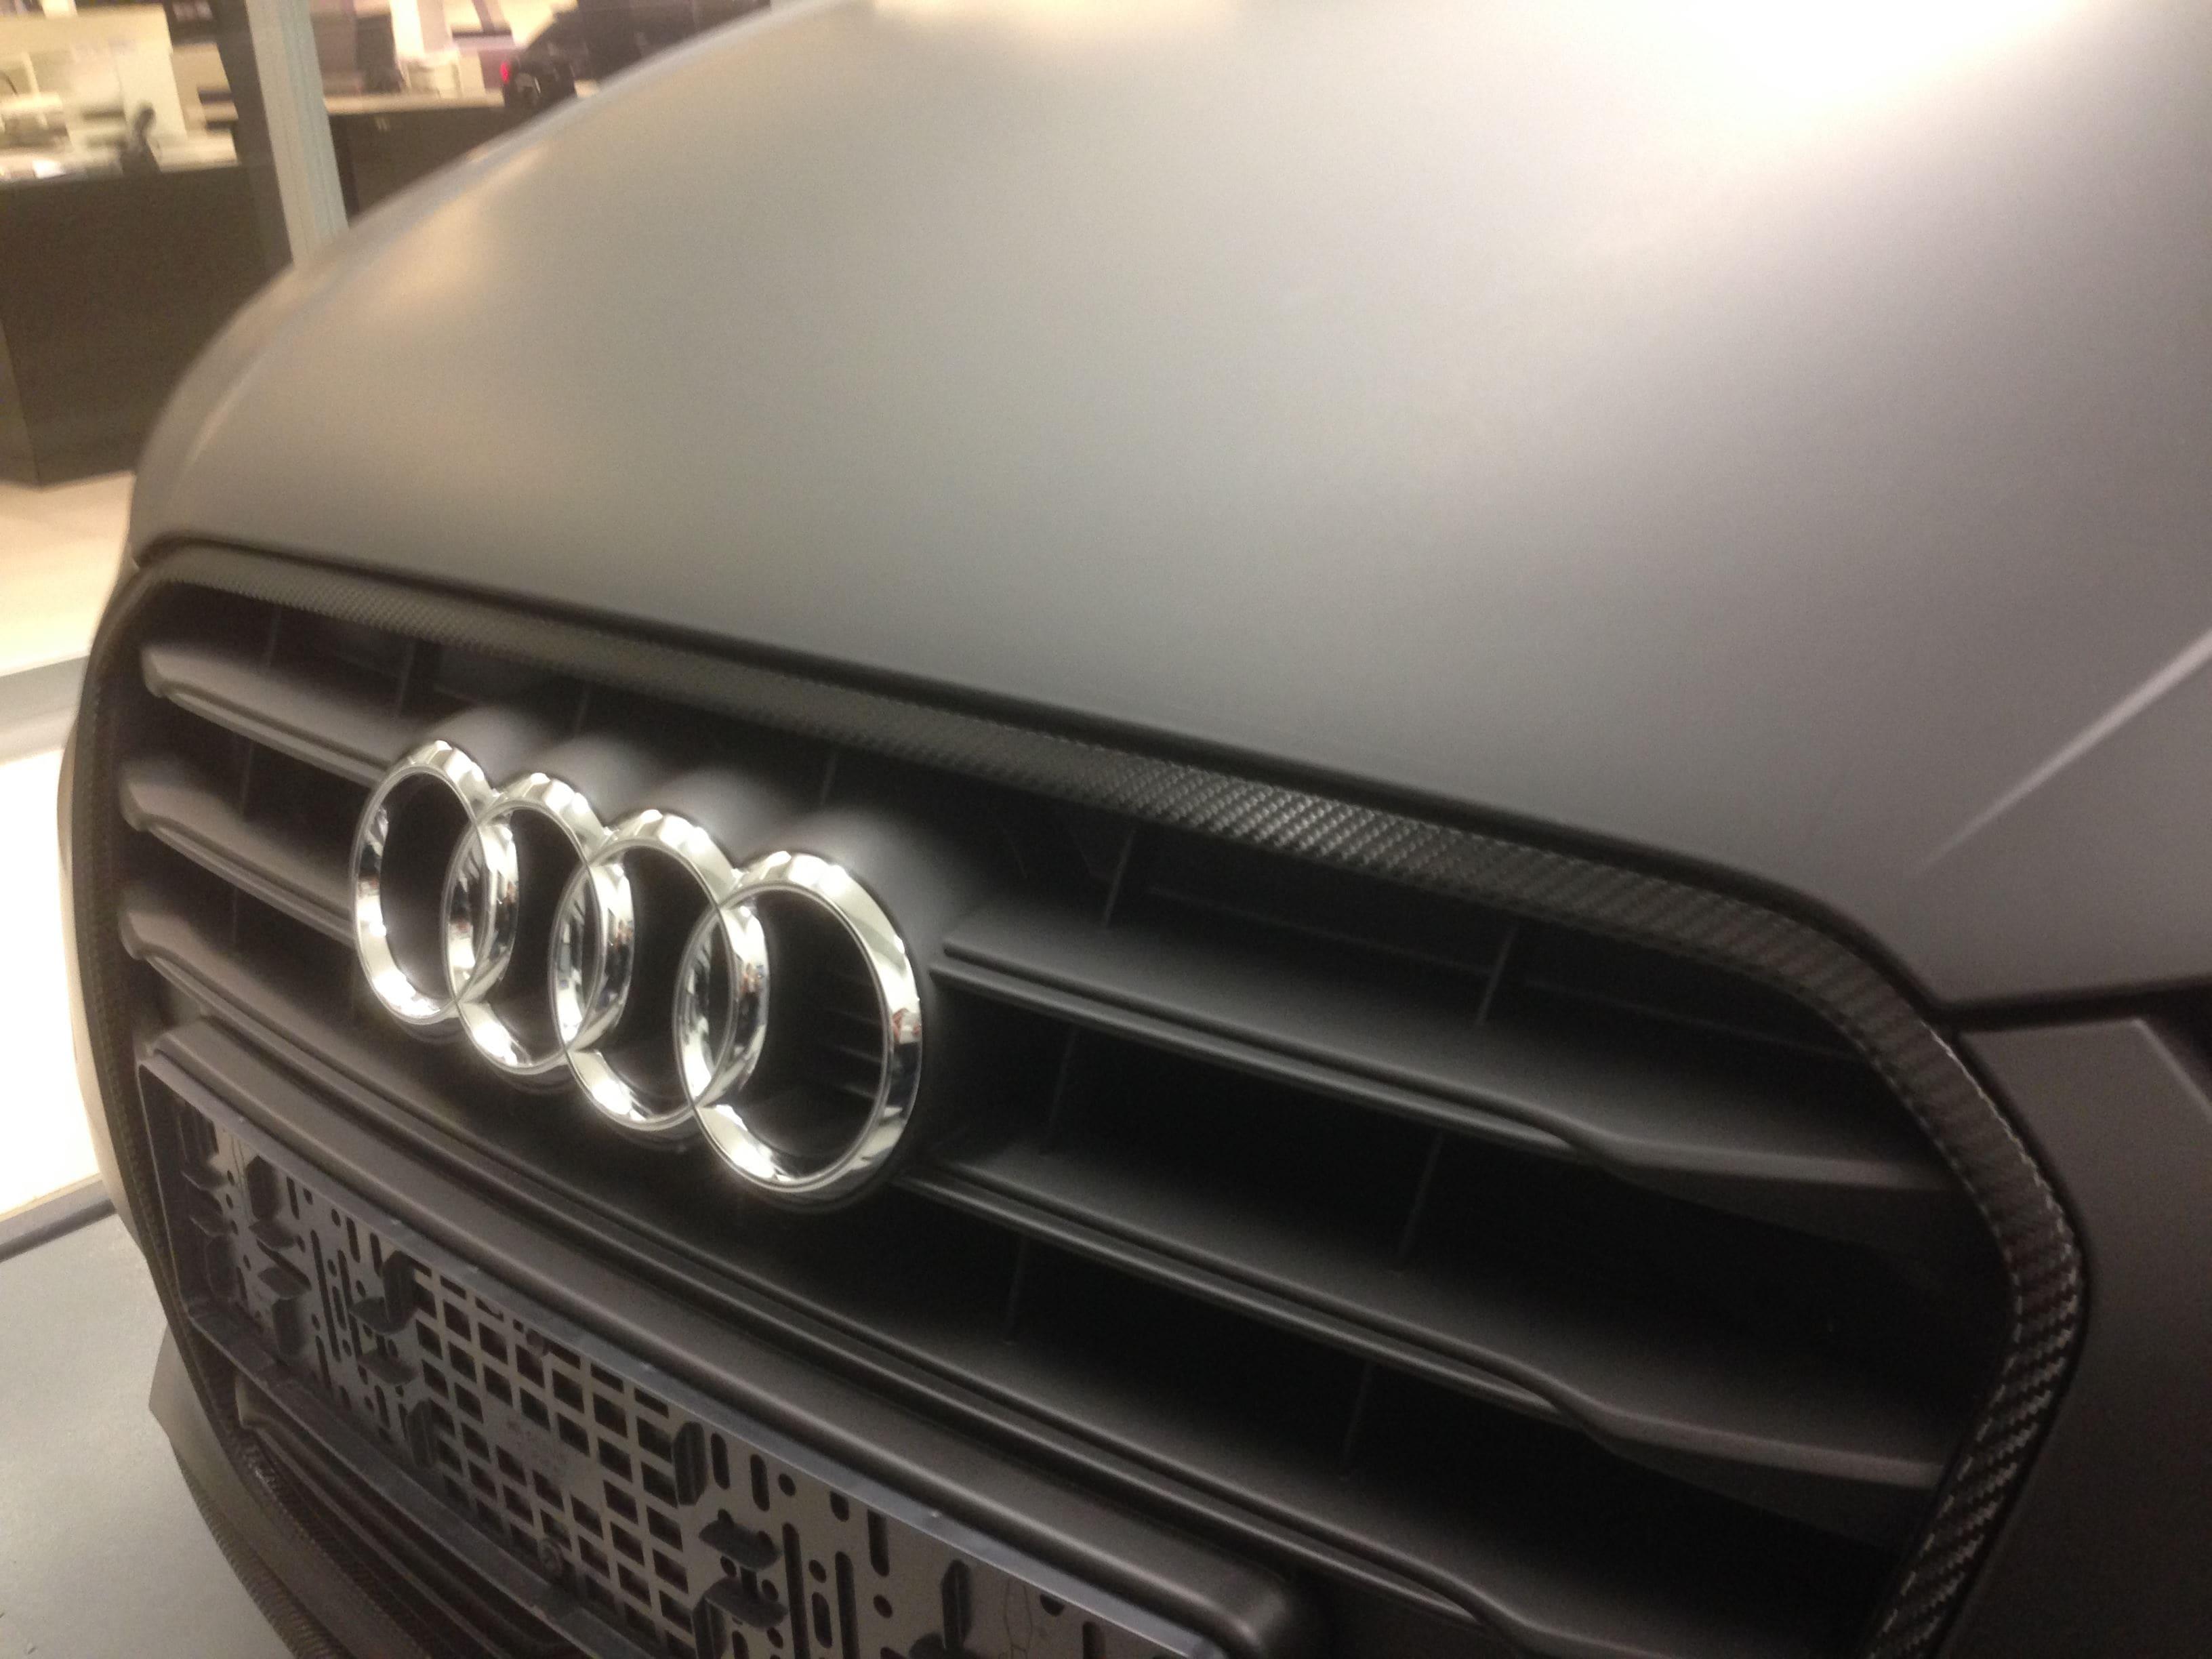 Audi A3 2014 met Mat Zwarte Wrap, Carwrapping door Wrapmyride.nu Foto-nr:4470, ©2021